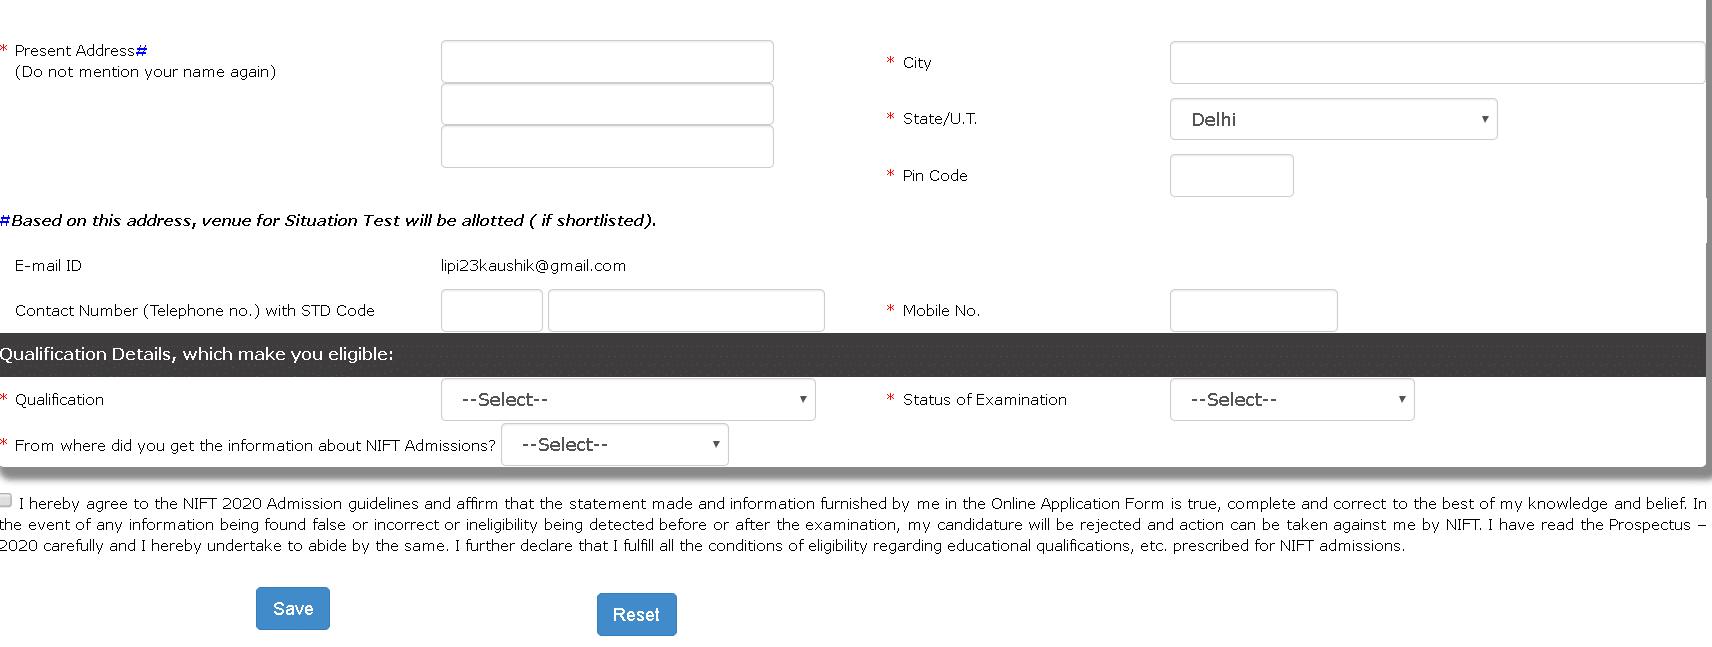 NIFT Application Form Contact Details